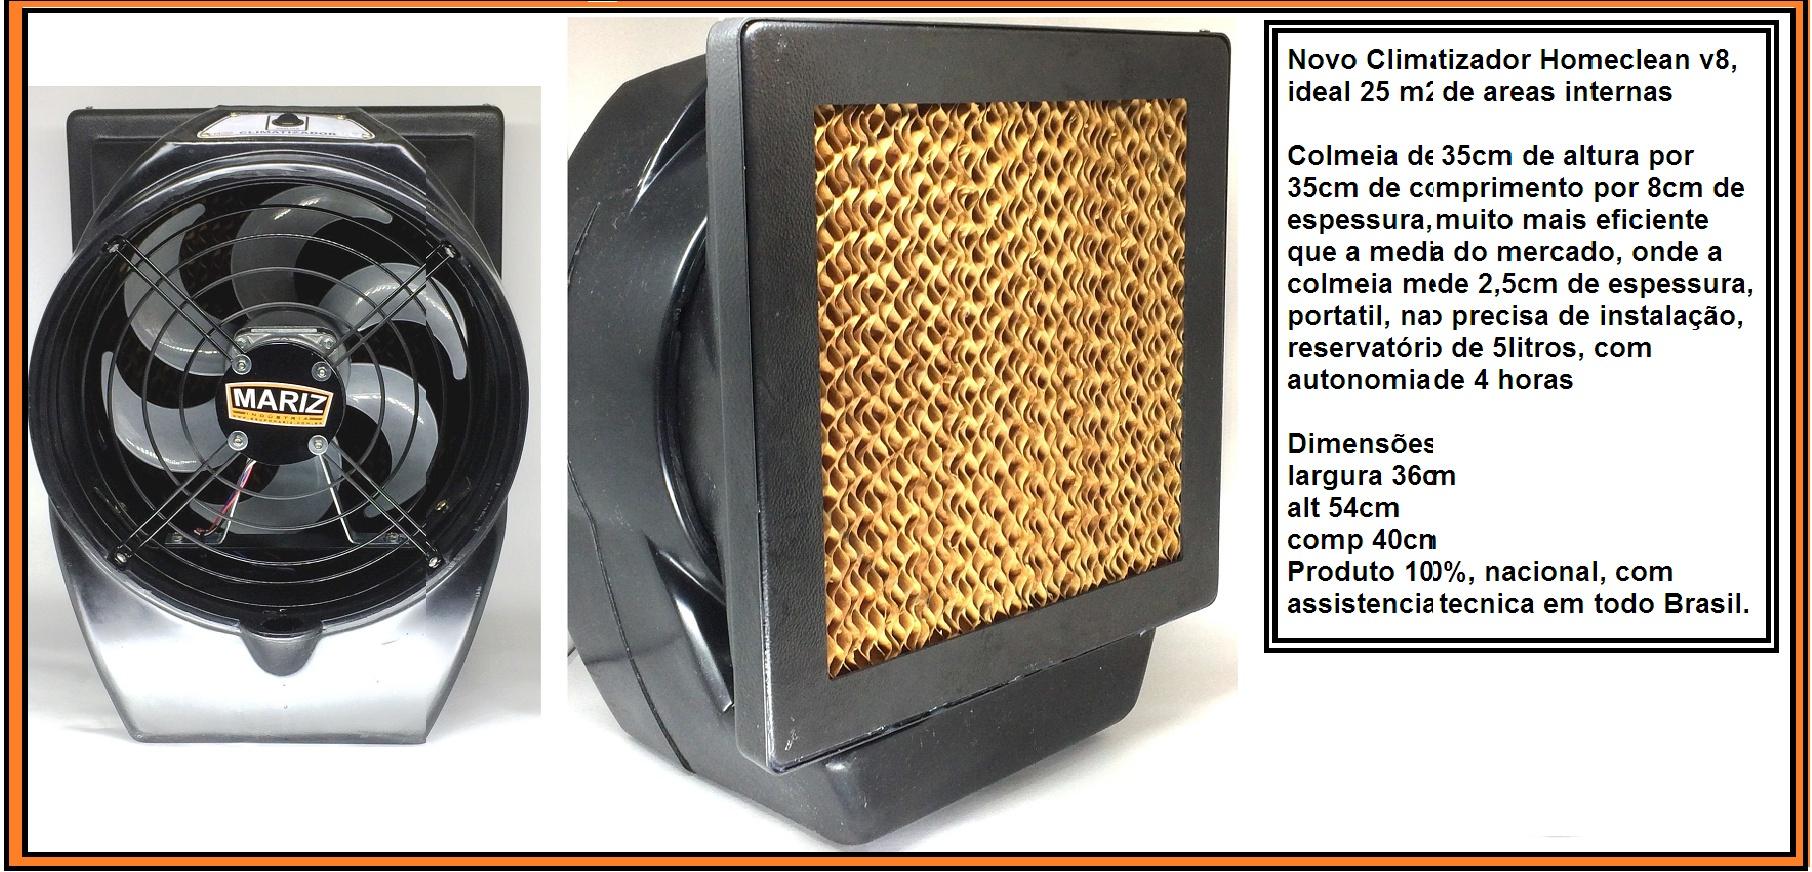 Climatizador Ambiente interno Homeclean V8